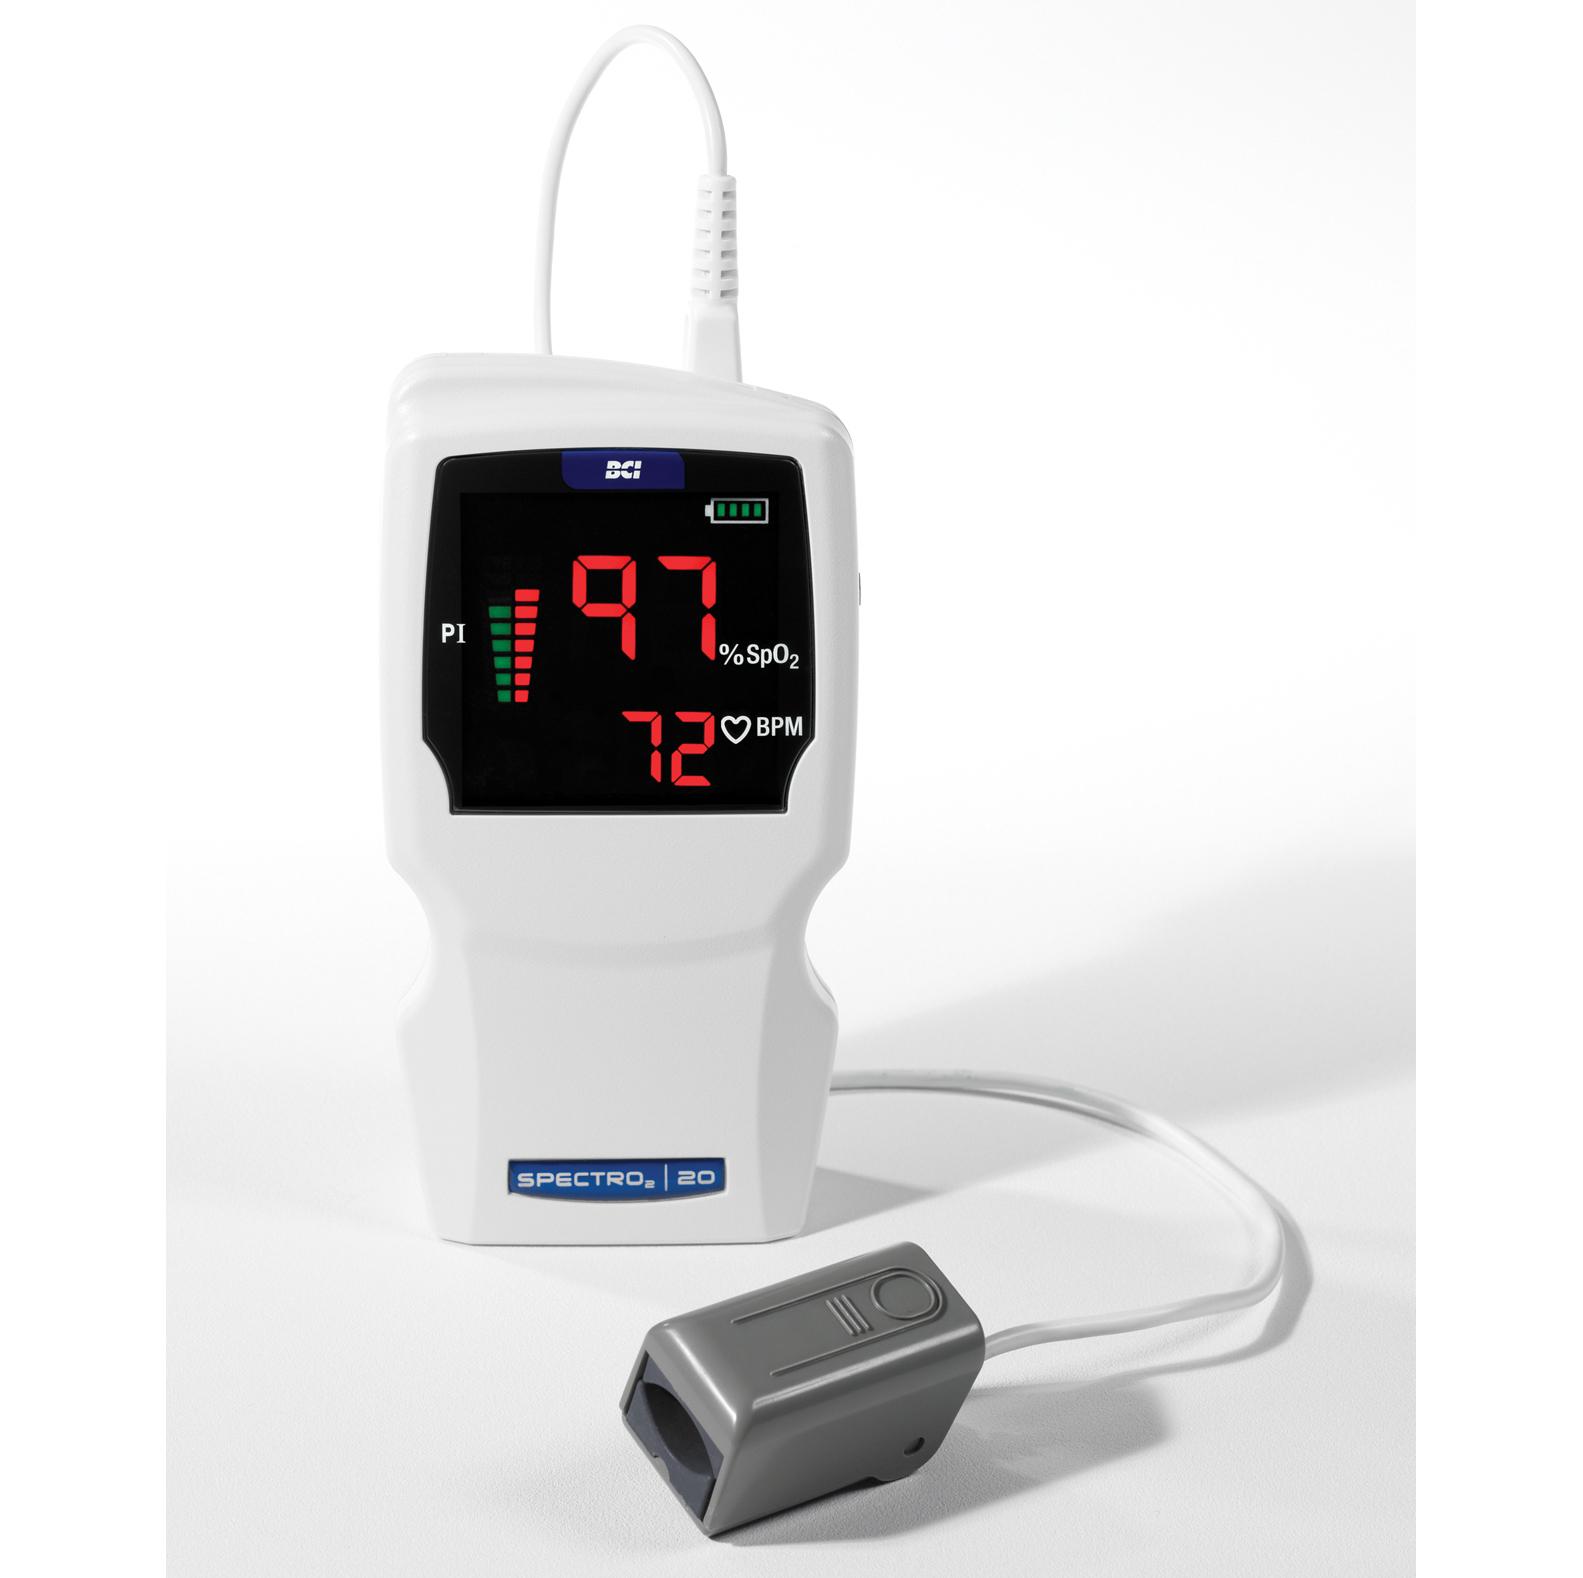 Spectro2 20 Digital Pulse Oximeter